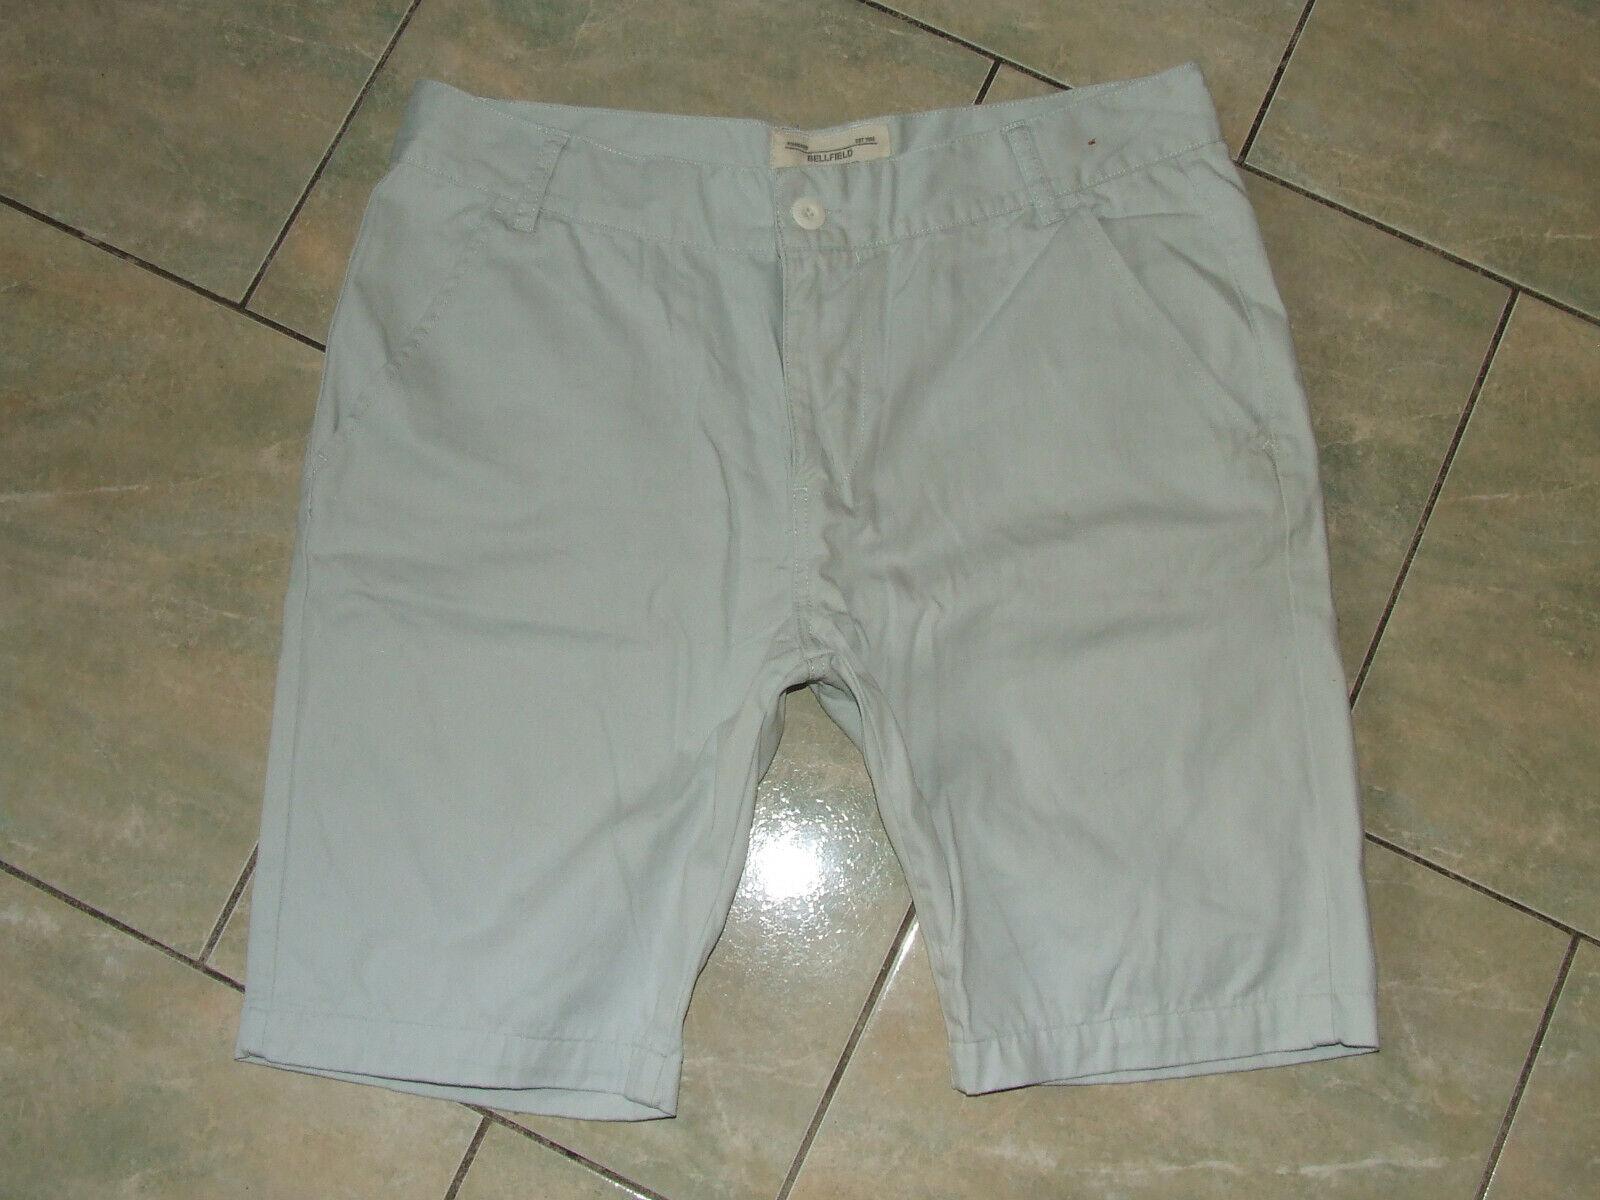 Bellfield***gepflegte hellgraue Shorts Bermuda***W36